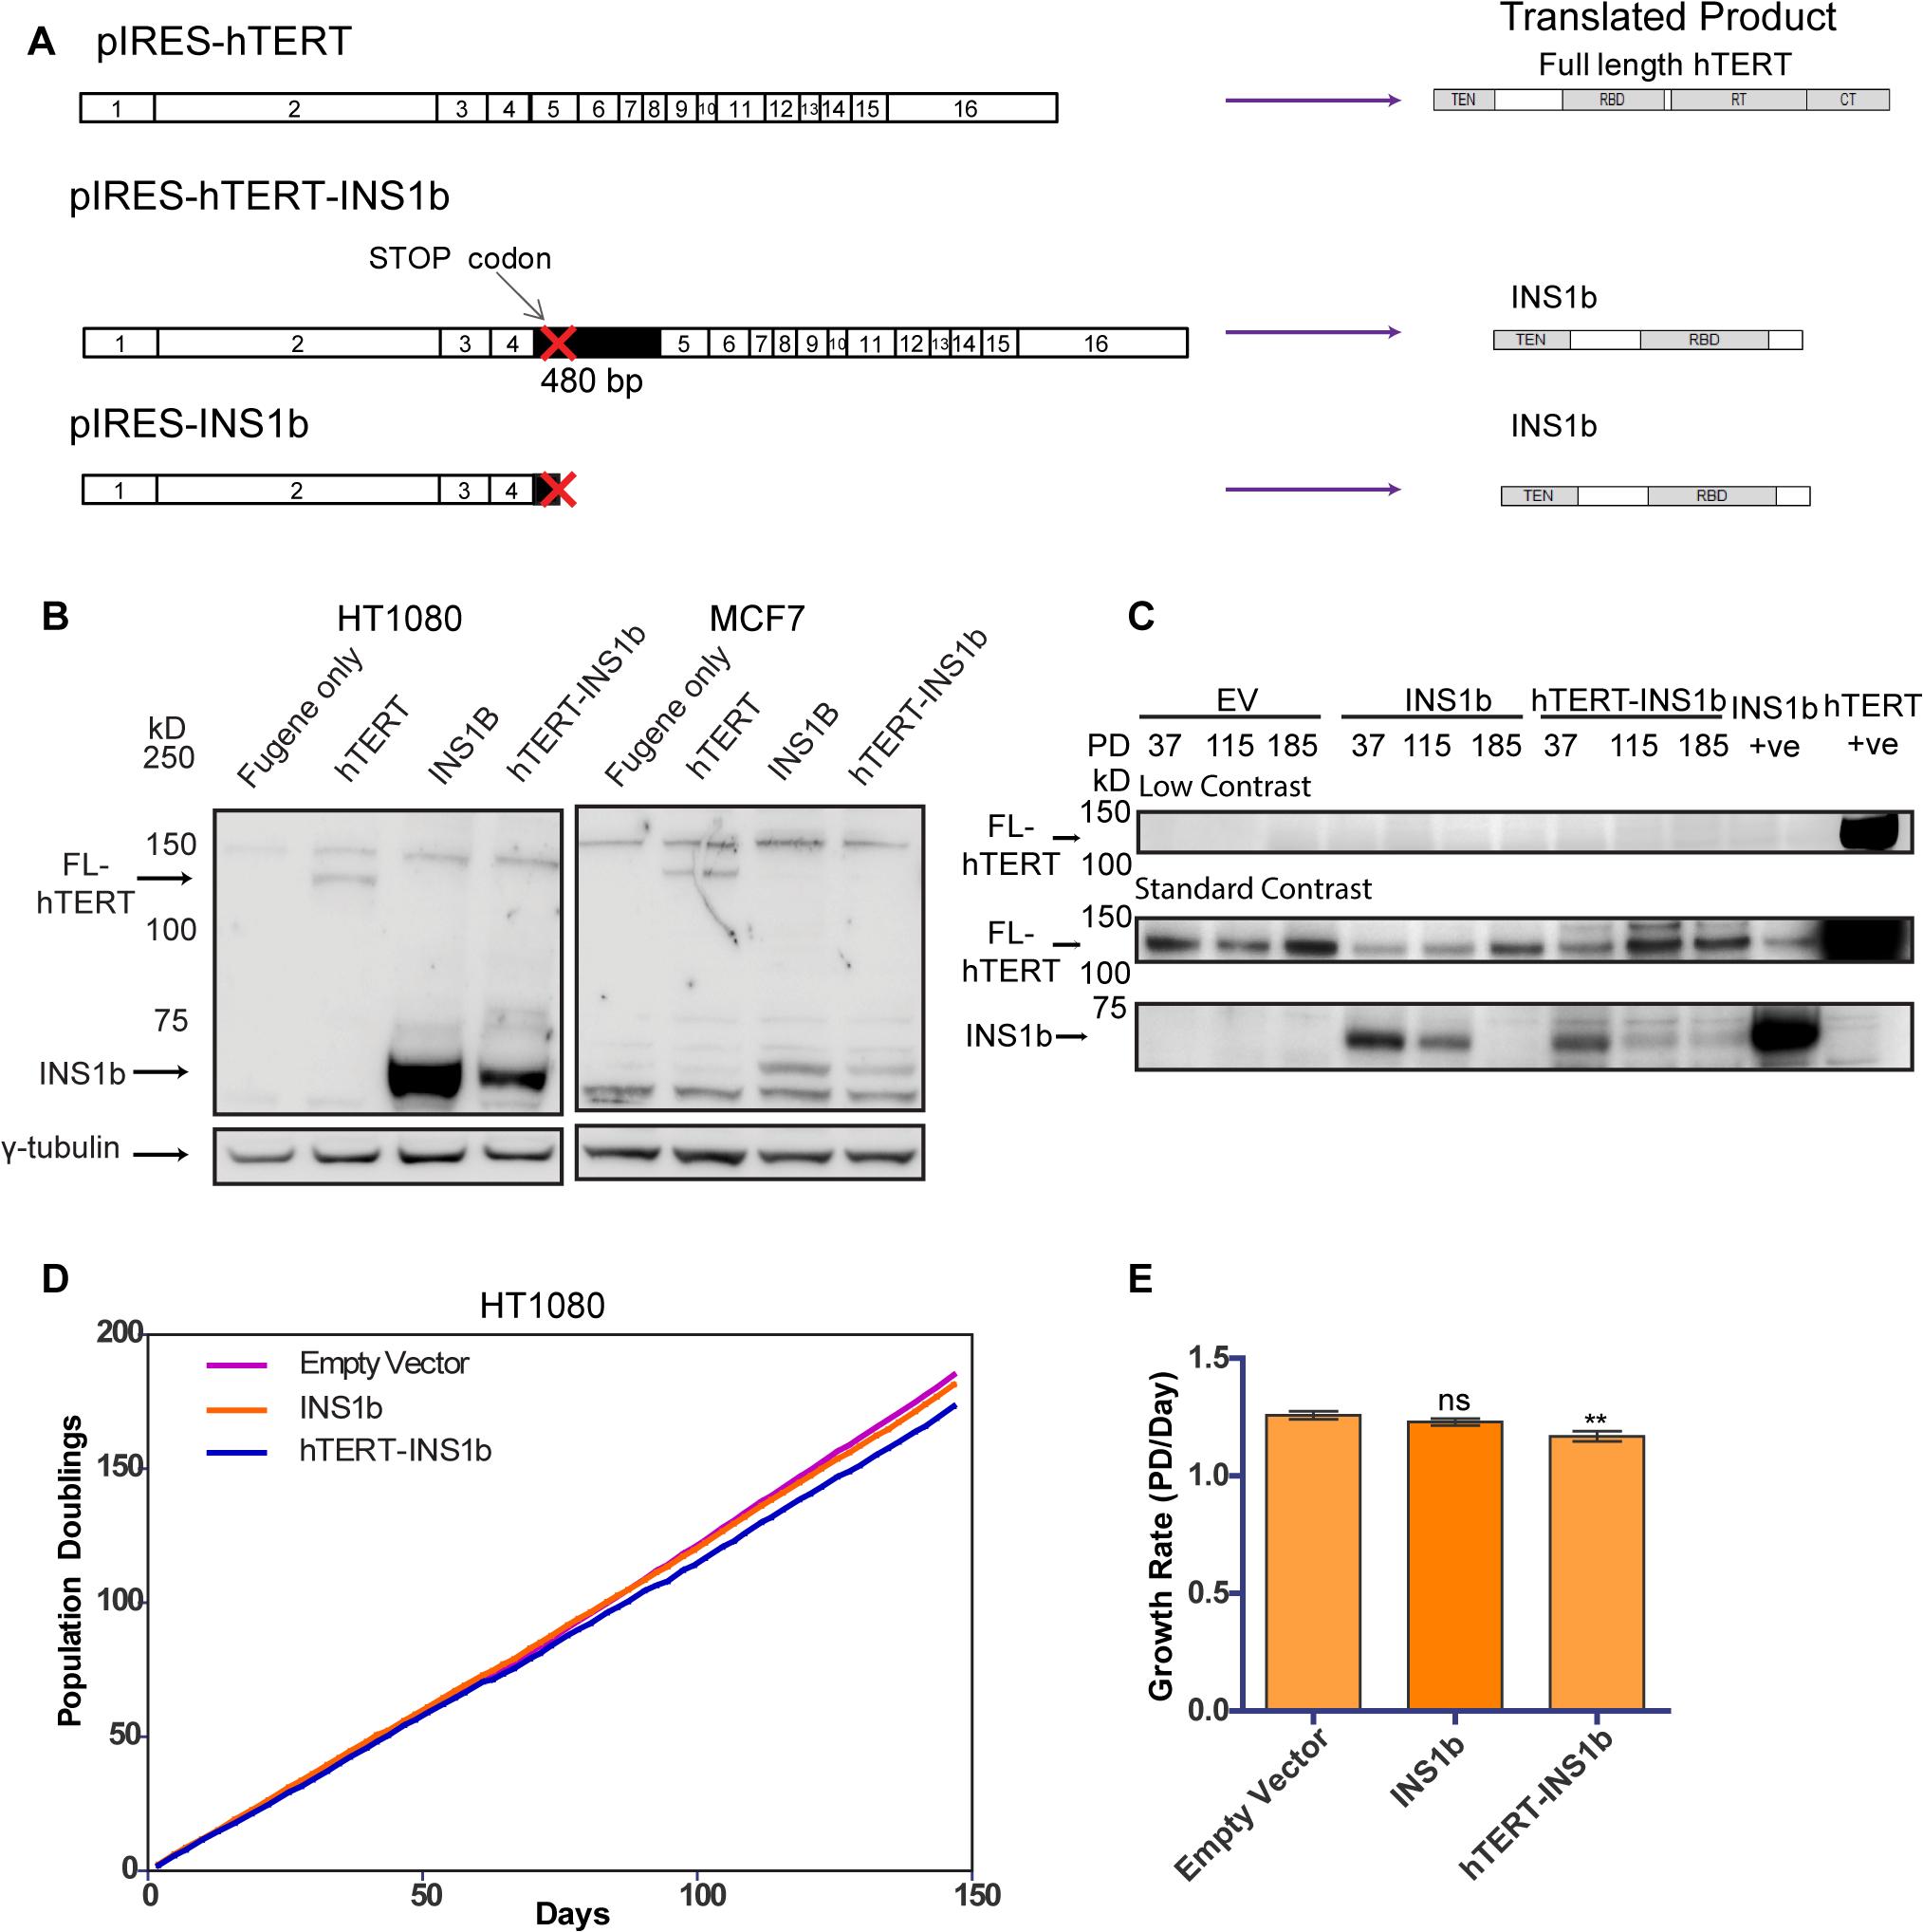 INS1b inhibits cell proliferation.